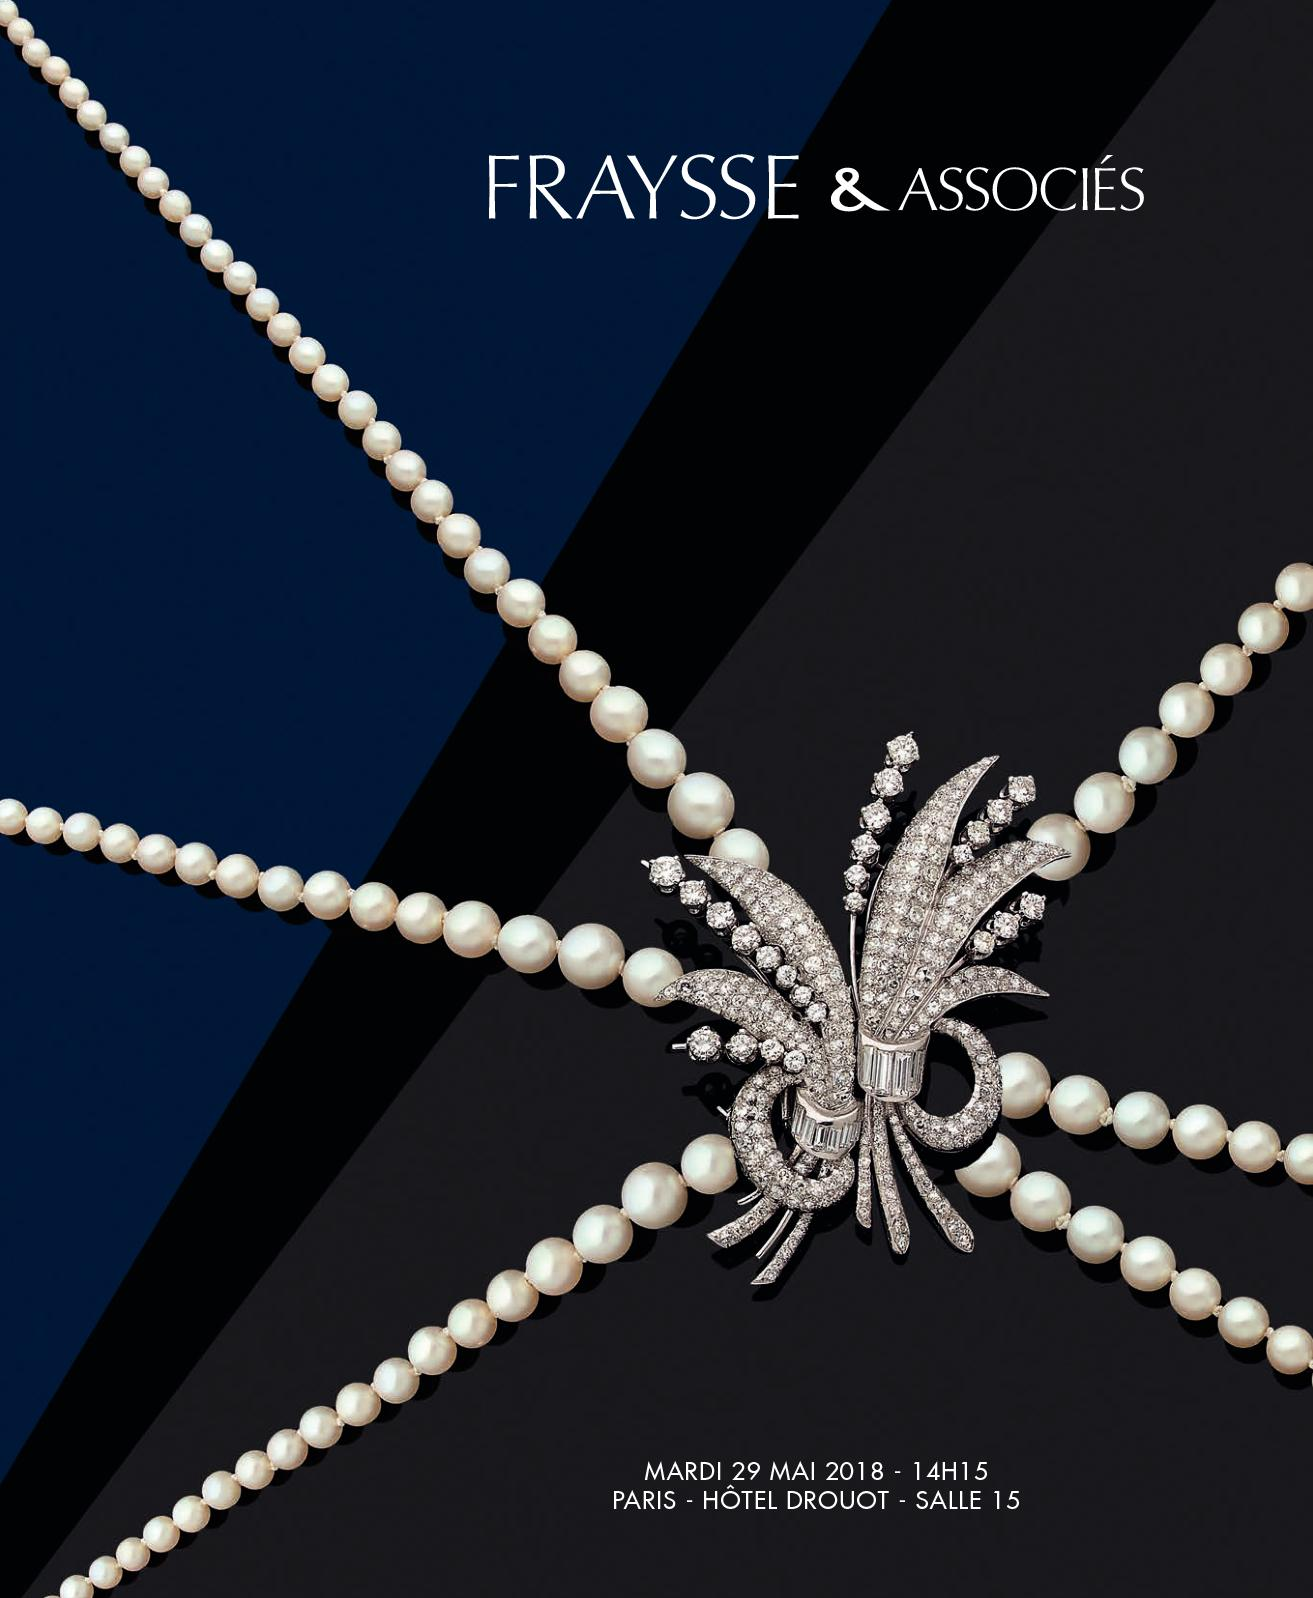 Calaméo - Fraysse29052018md e51c1595755